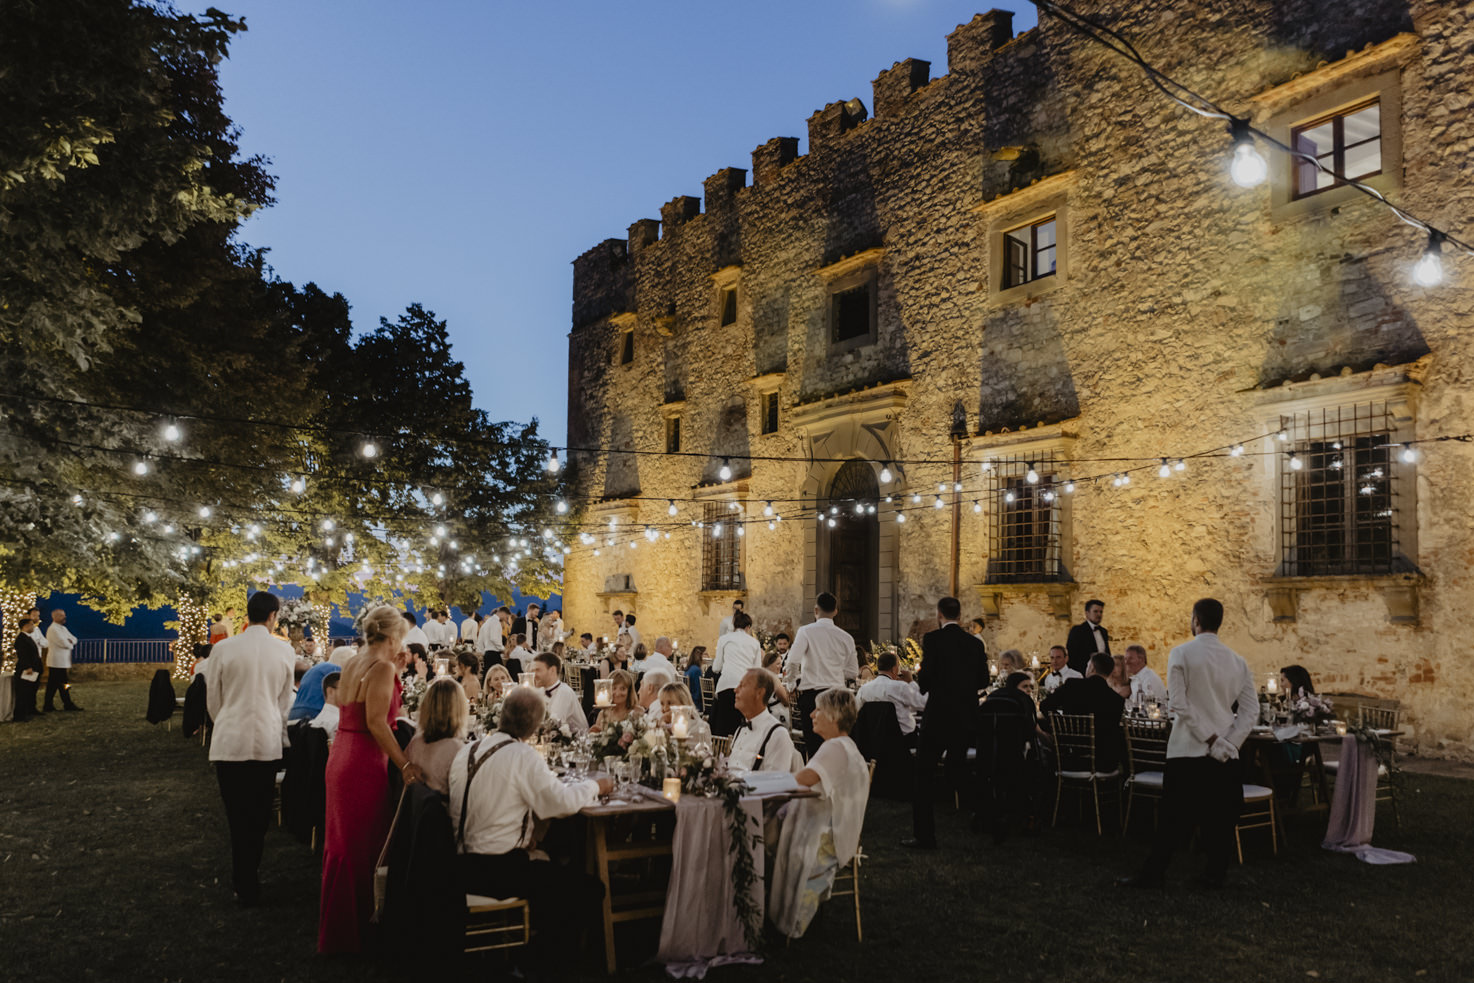 Wedding banquet by night